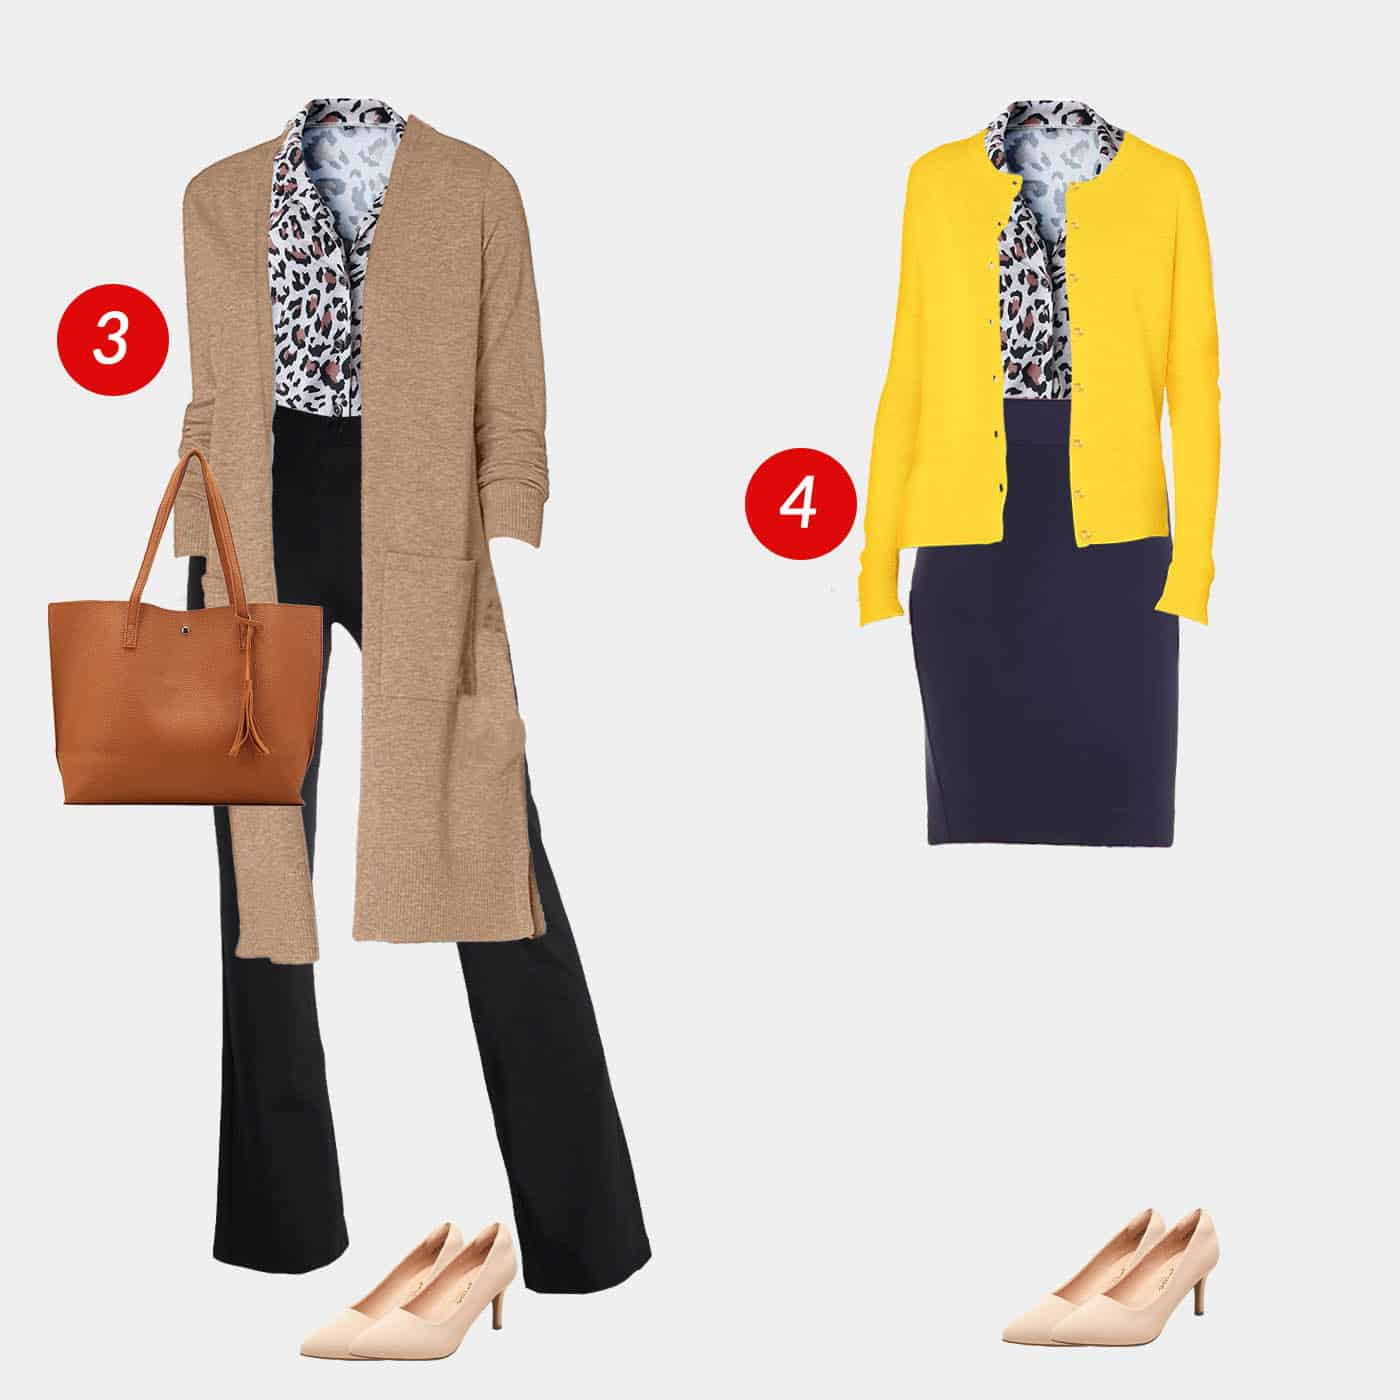 18 Piece Business Casual Amazon Capsule Wardrobe 3